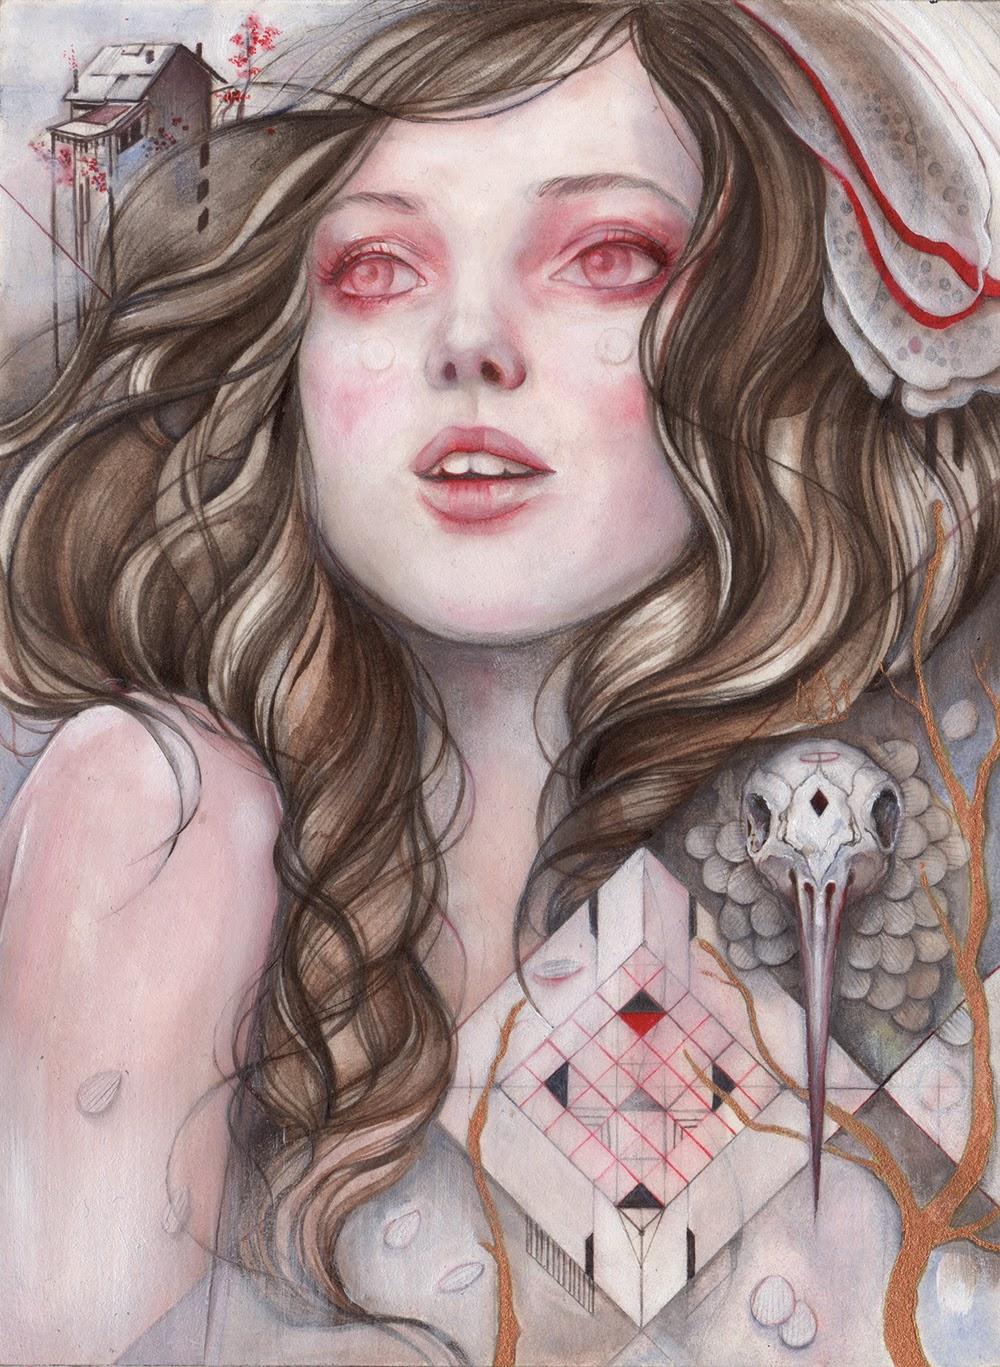 Nederlandse illustrator, Marjolein Caljouw